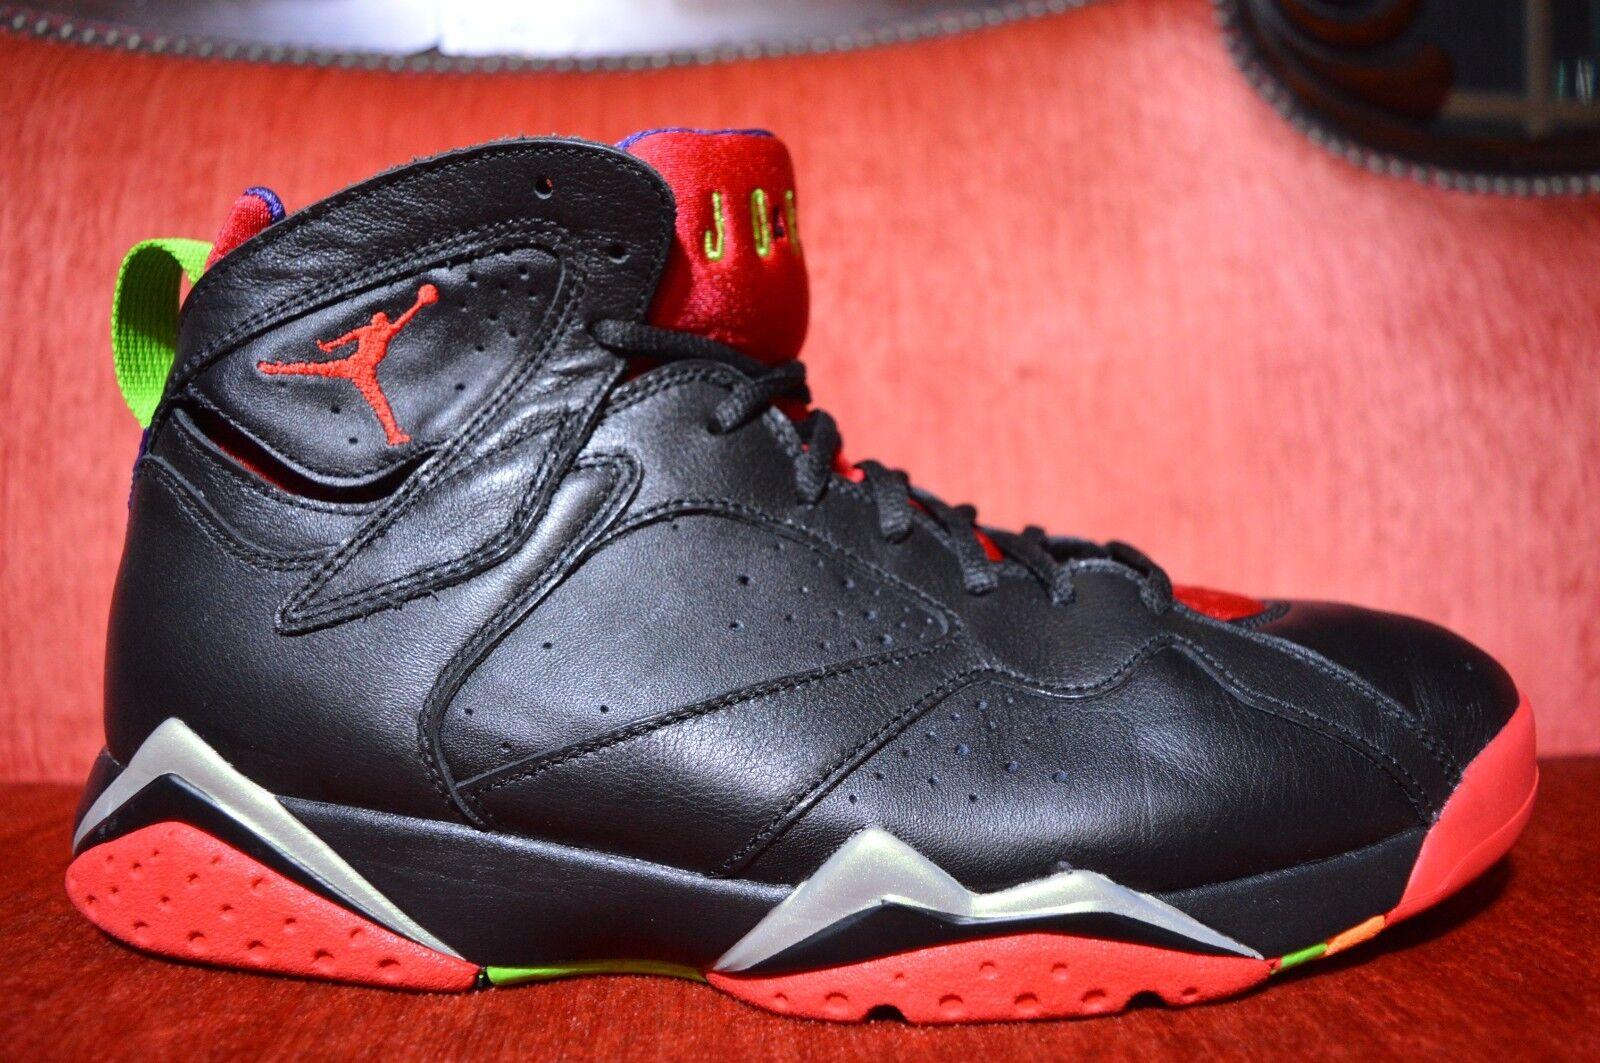 innovative design 2cffa 69072 WORN 1X Nike Air Jordan Retro VII 7 7 7 Marvin the Martian 304775-029